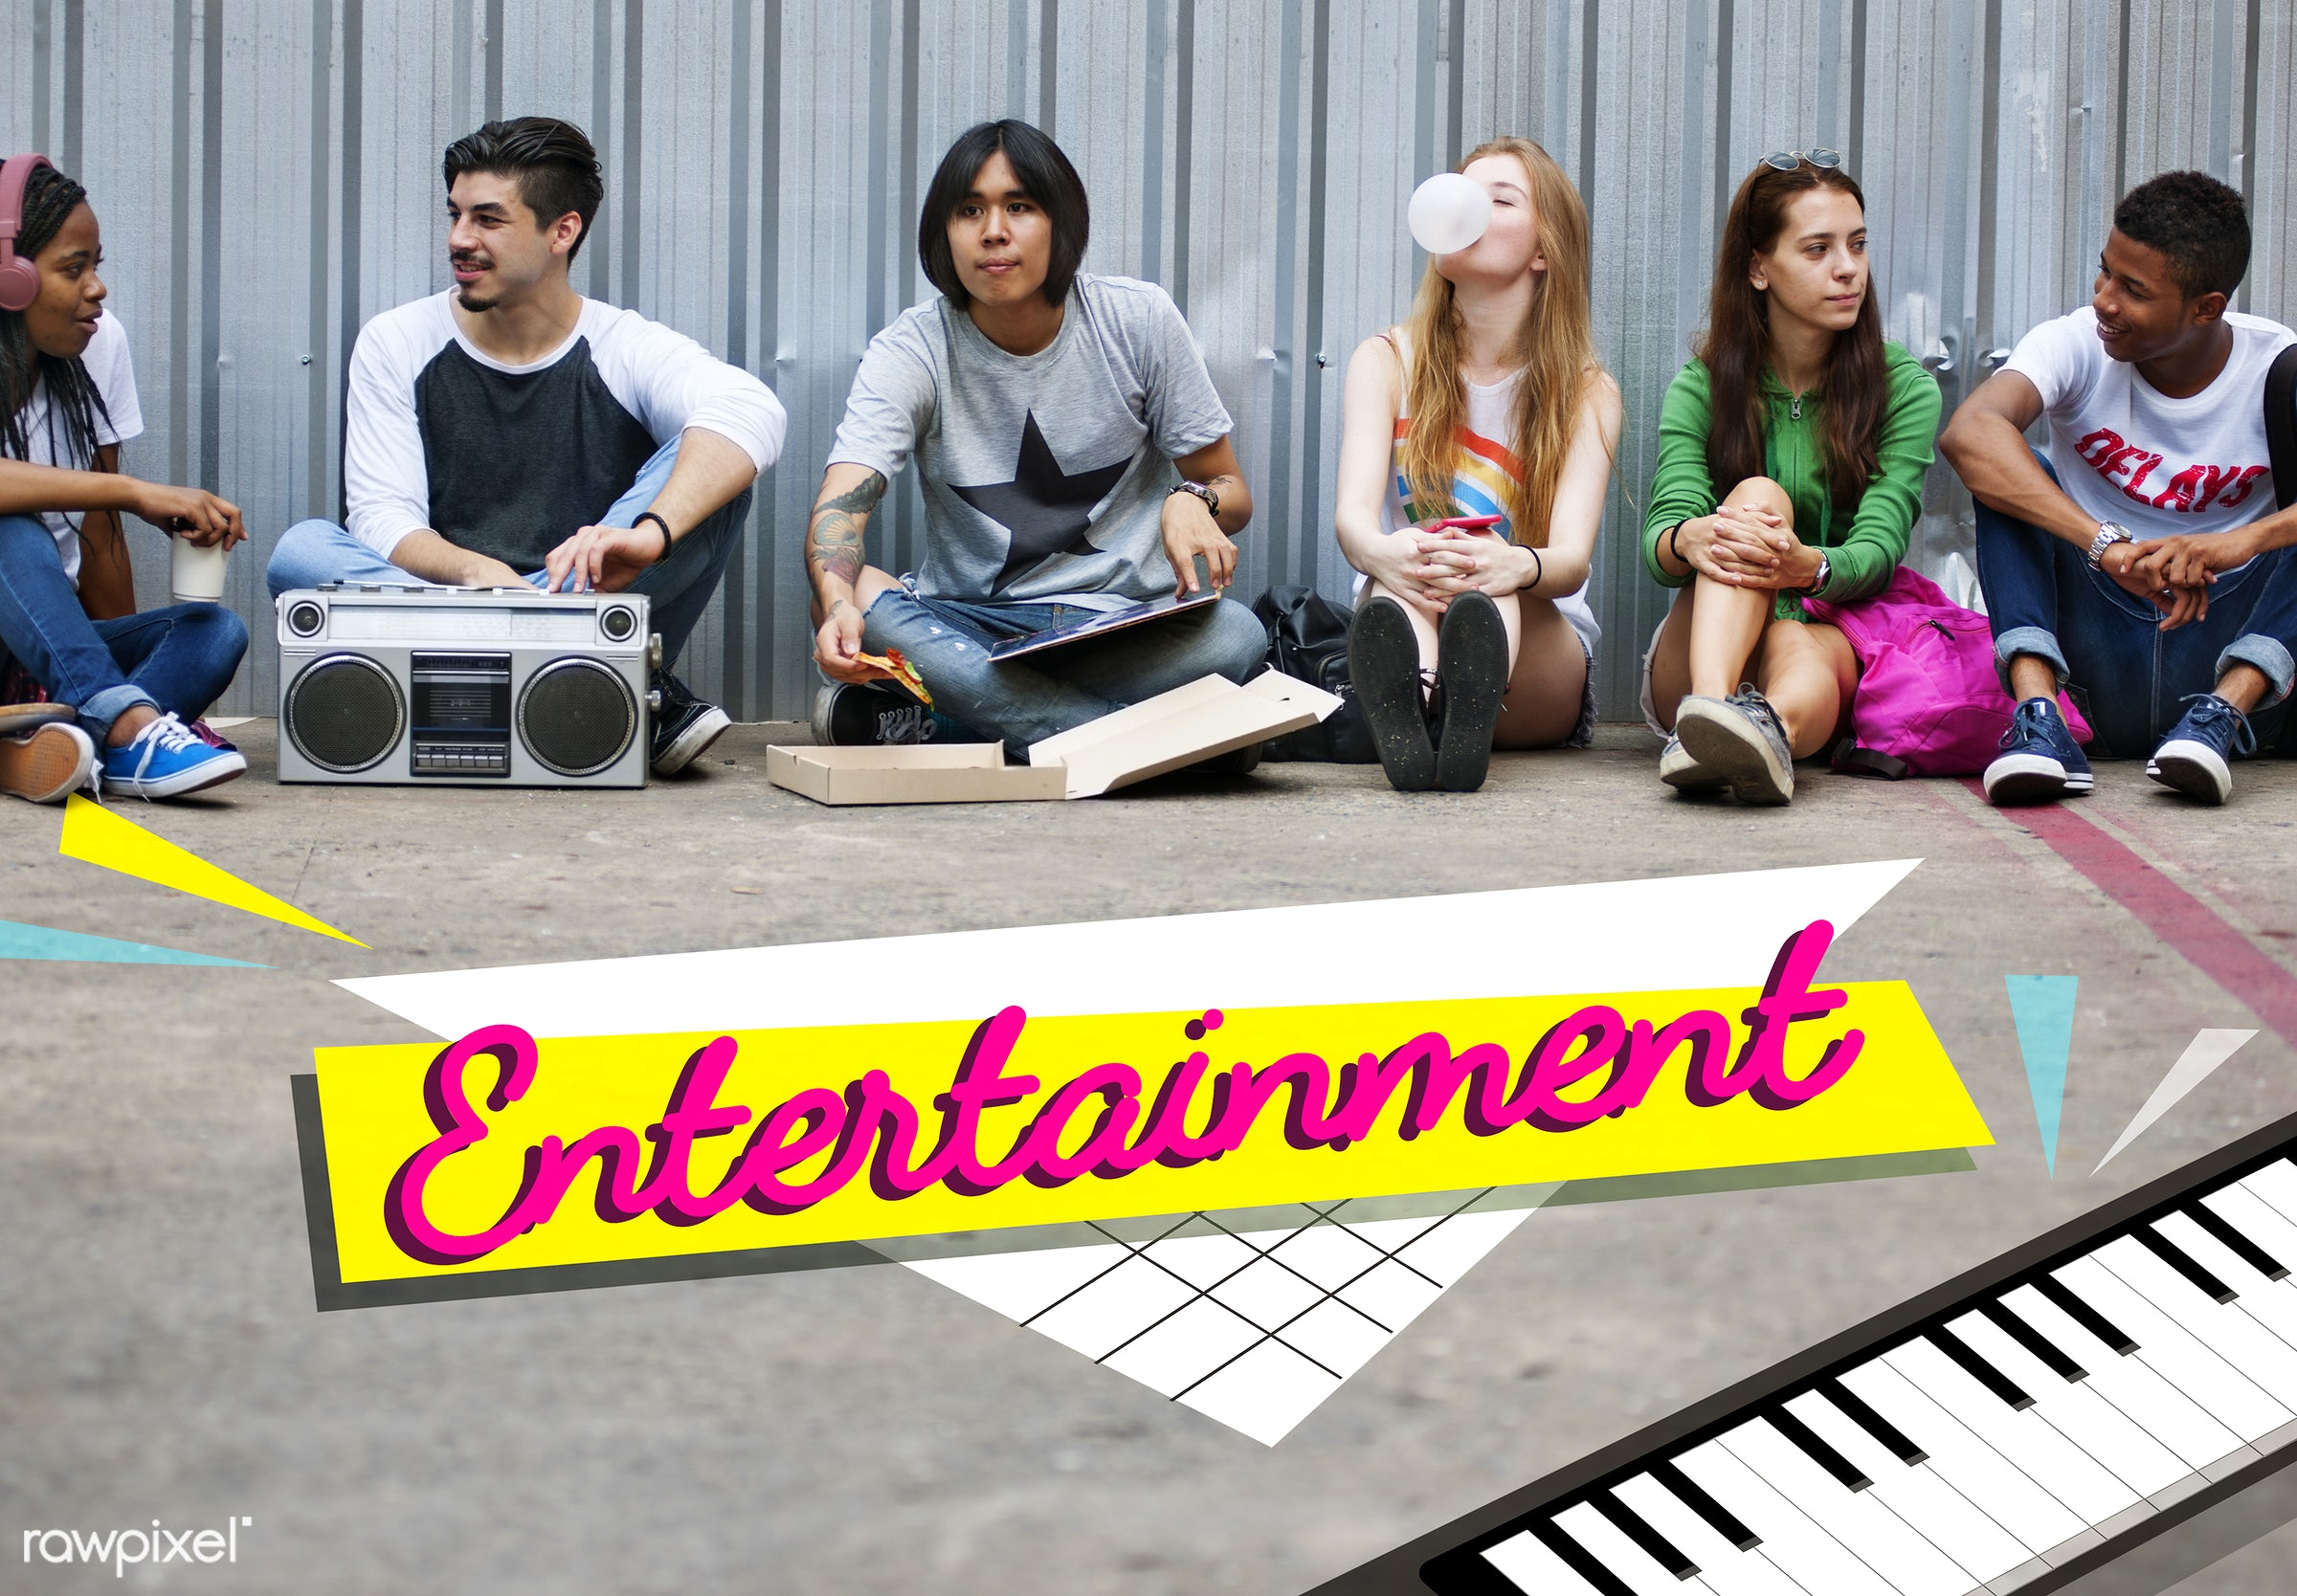 african descent, asian, audio, caucasian, diversity, enjoyment, entertainment, friends, friendship, fun, graphic, group,...